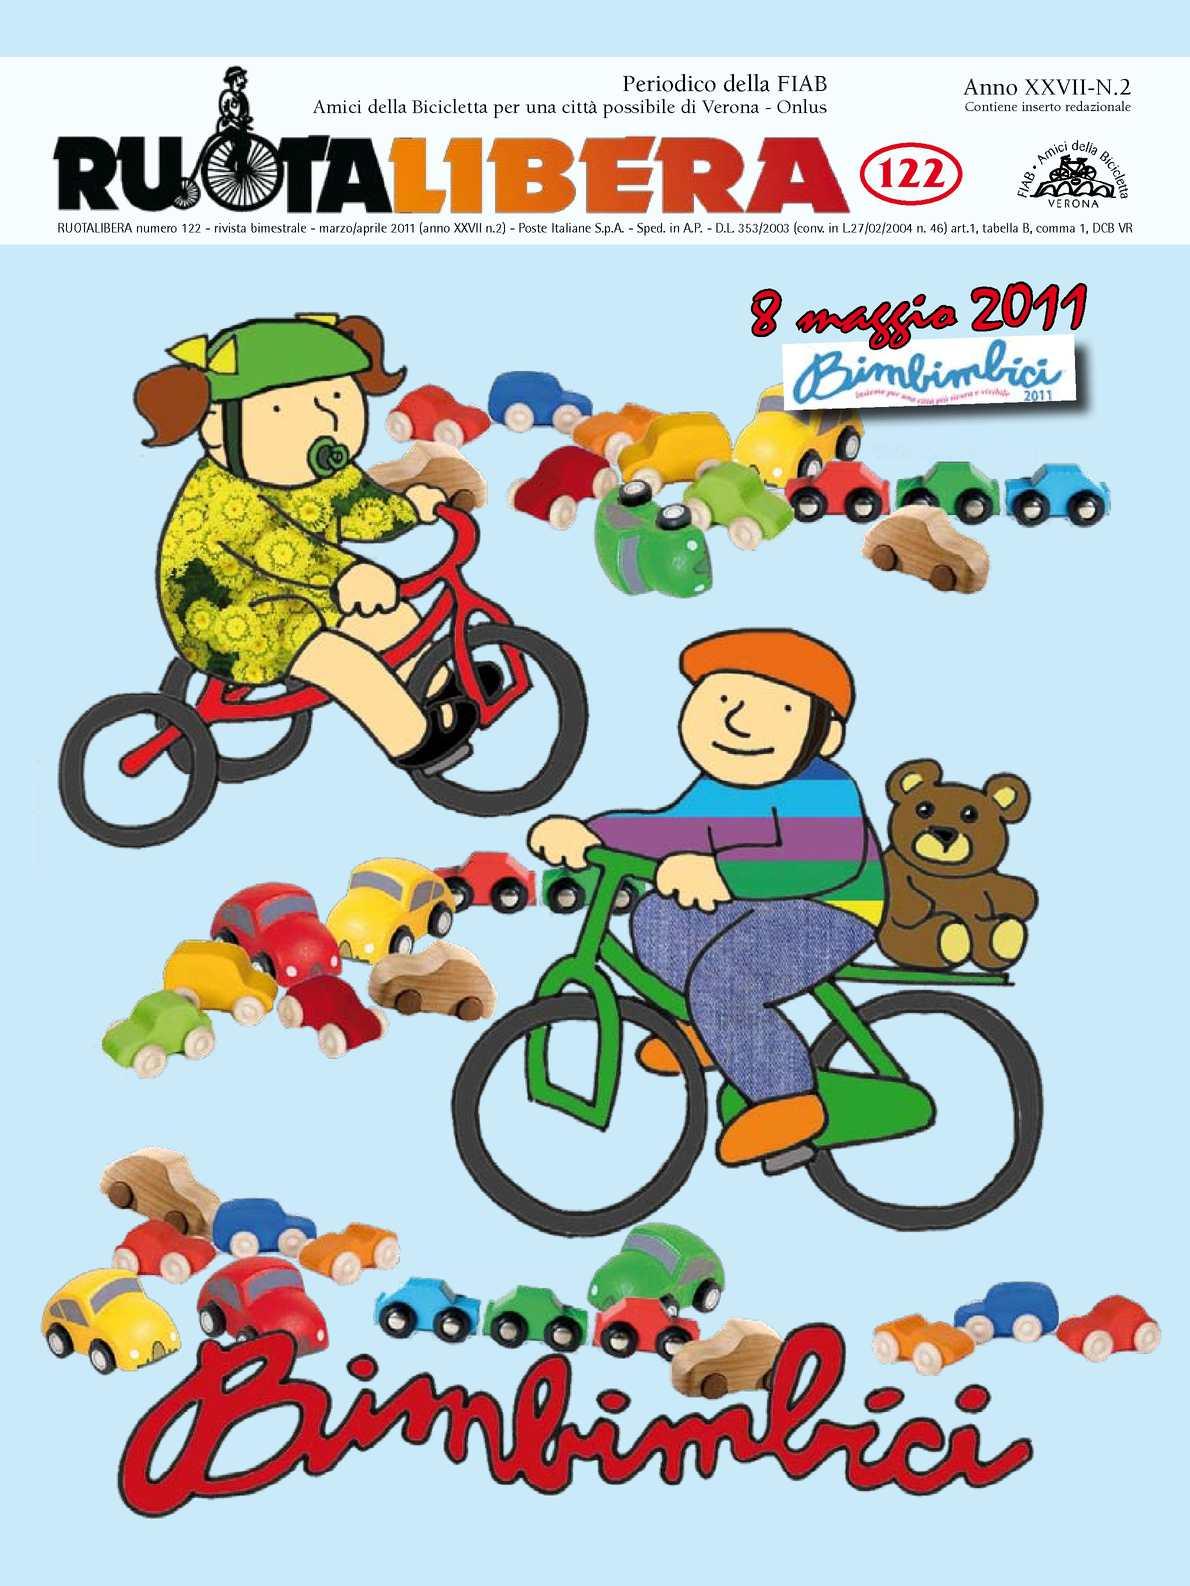 Ruotalibera 122 (marzo/aprile 2011) - FIAB AdB Verona